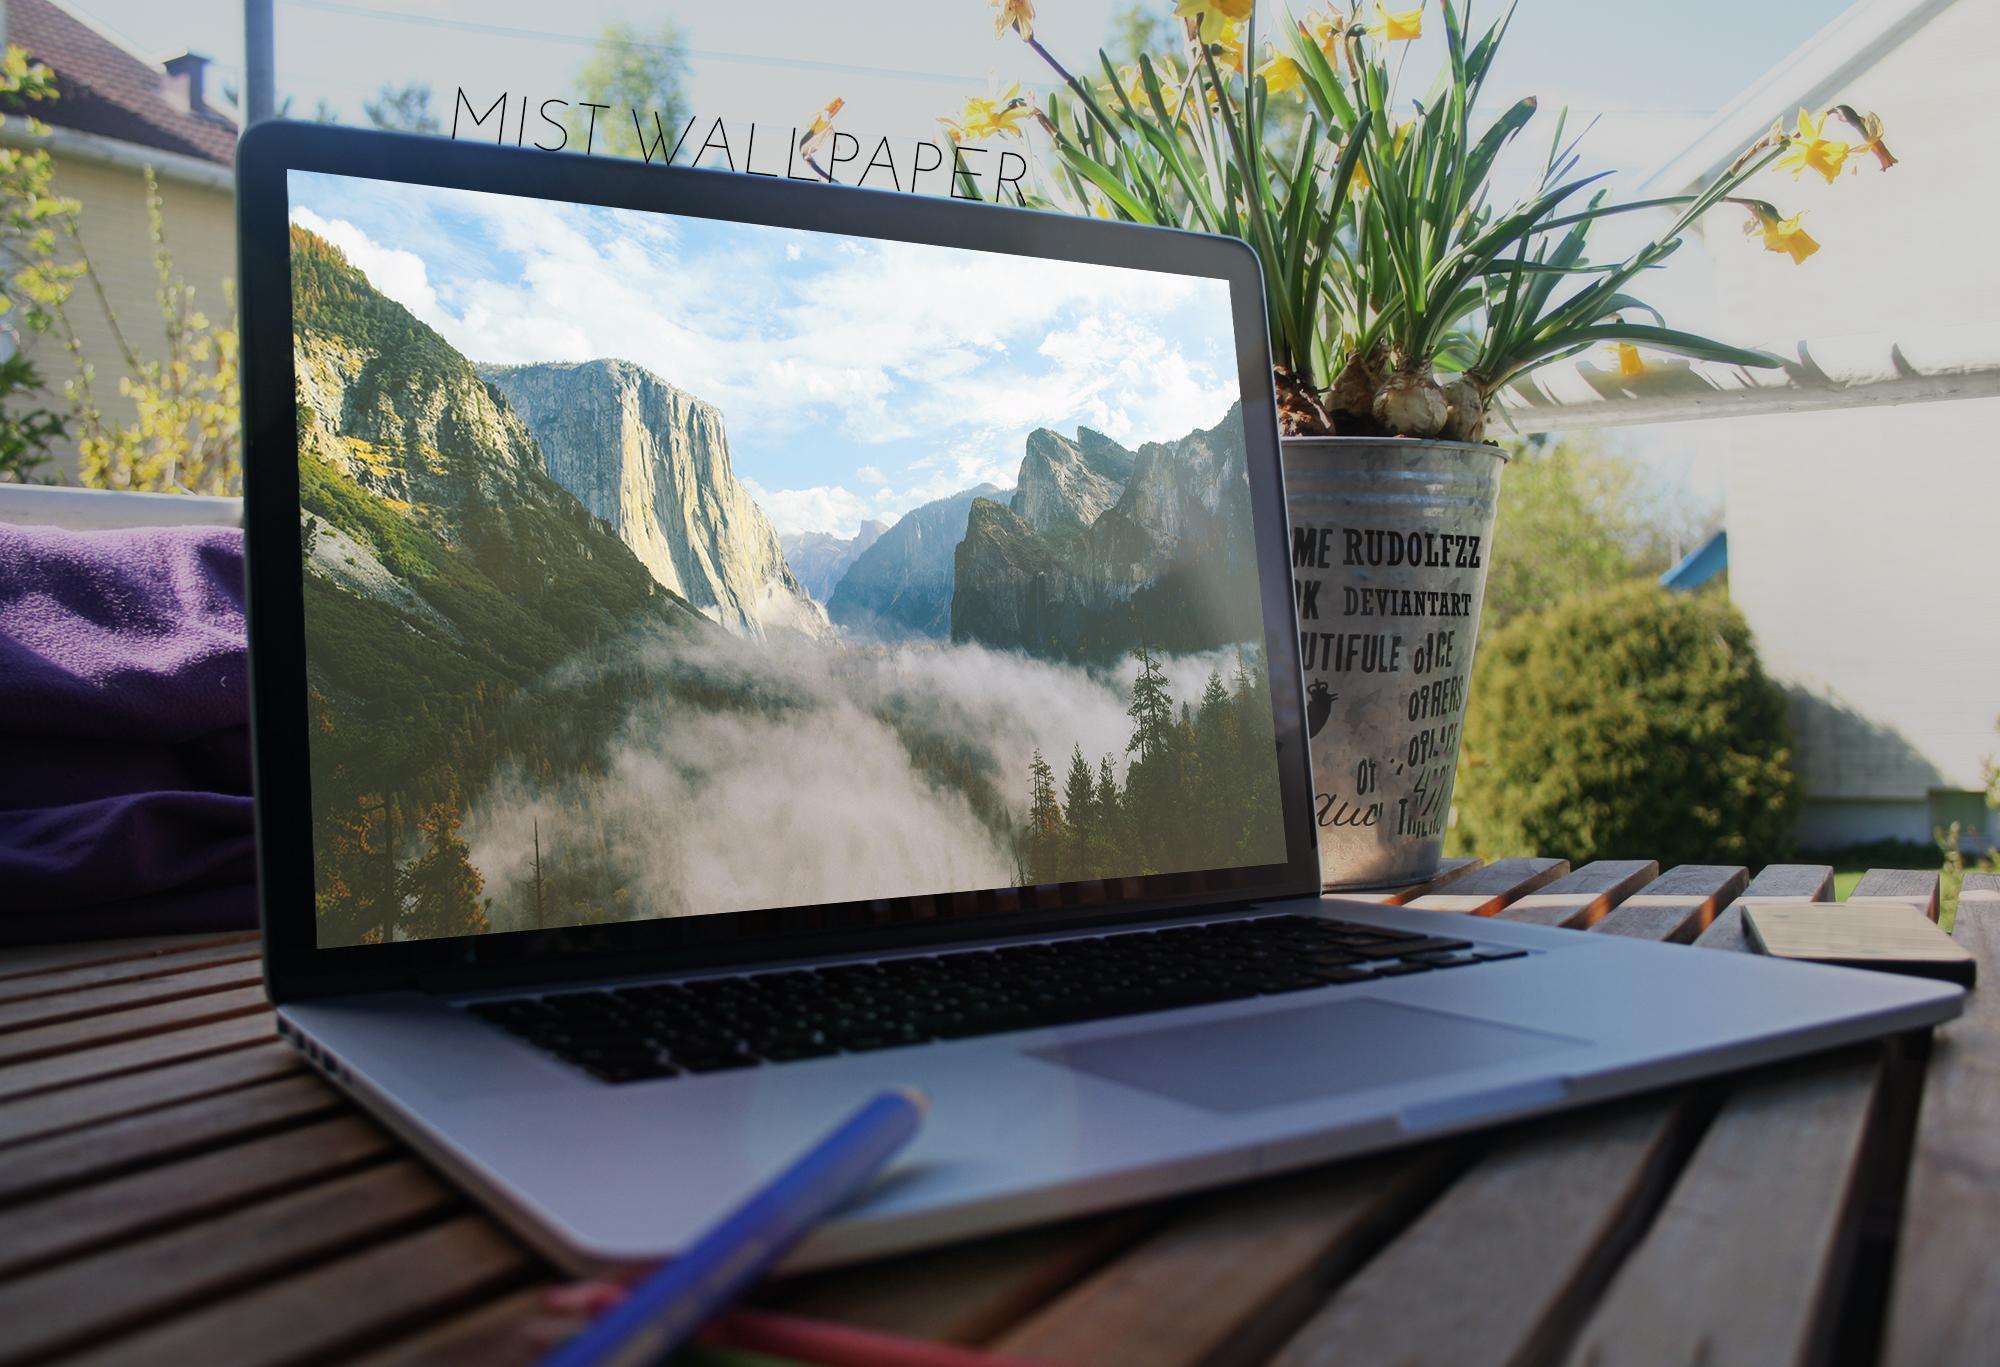 Mist V2 Wallpaper 4k by rudolfzz111